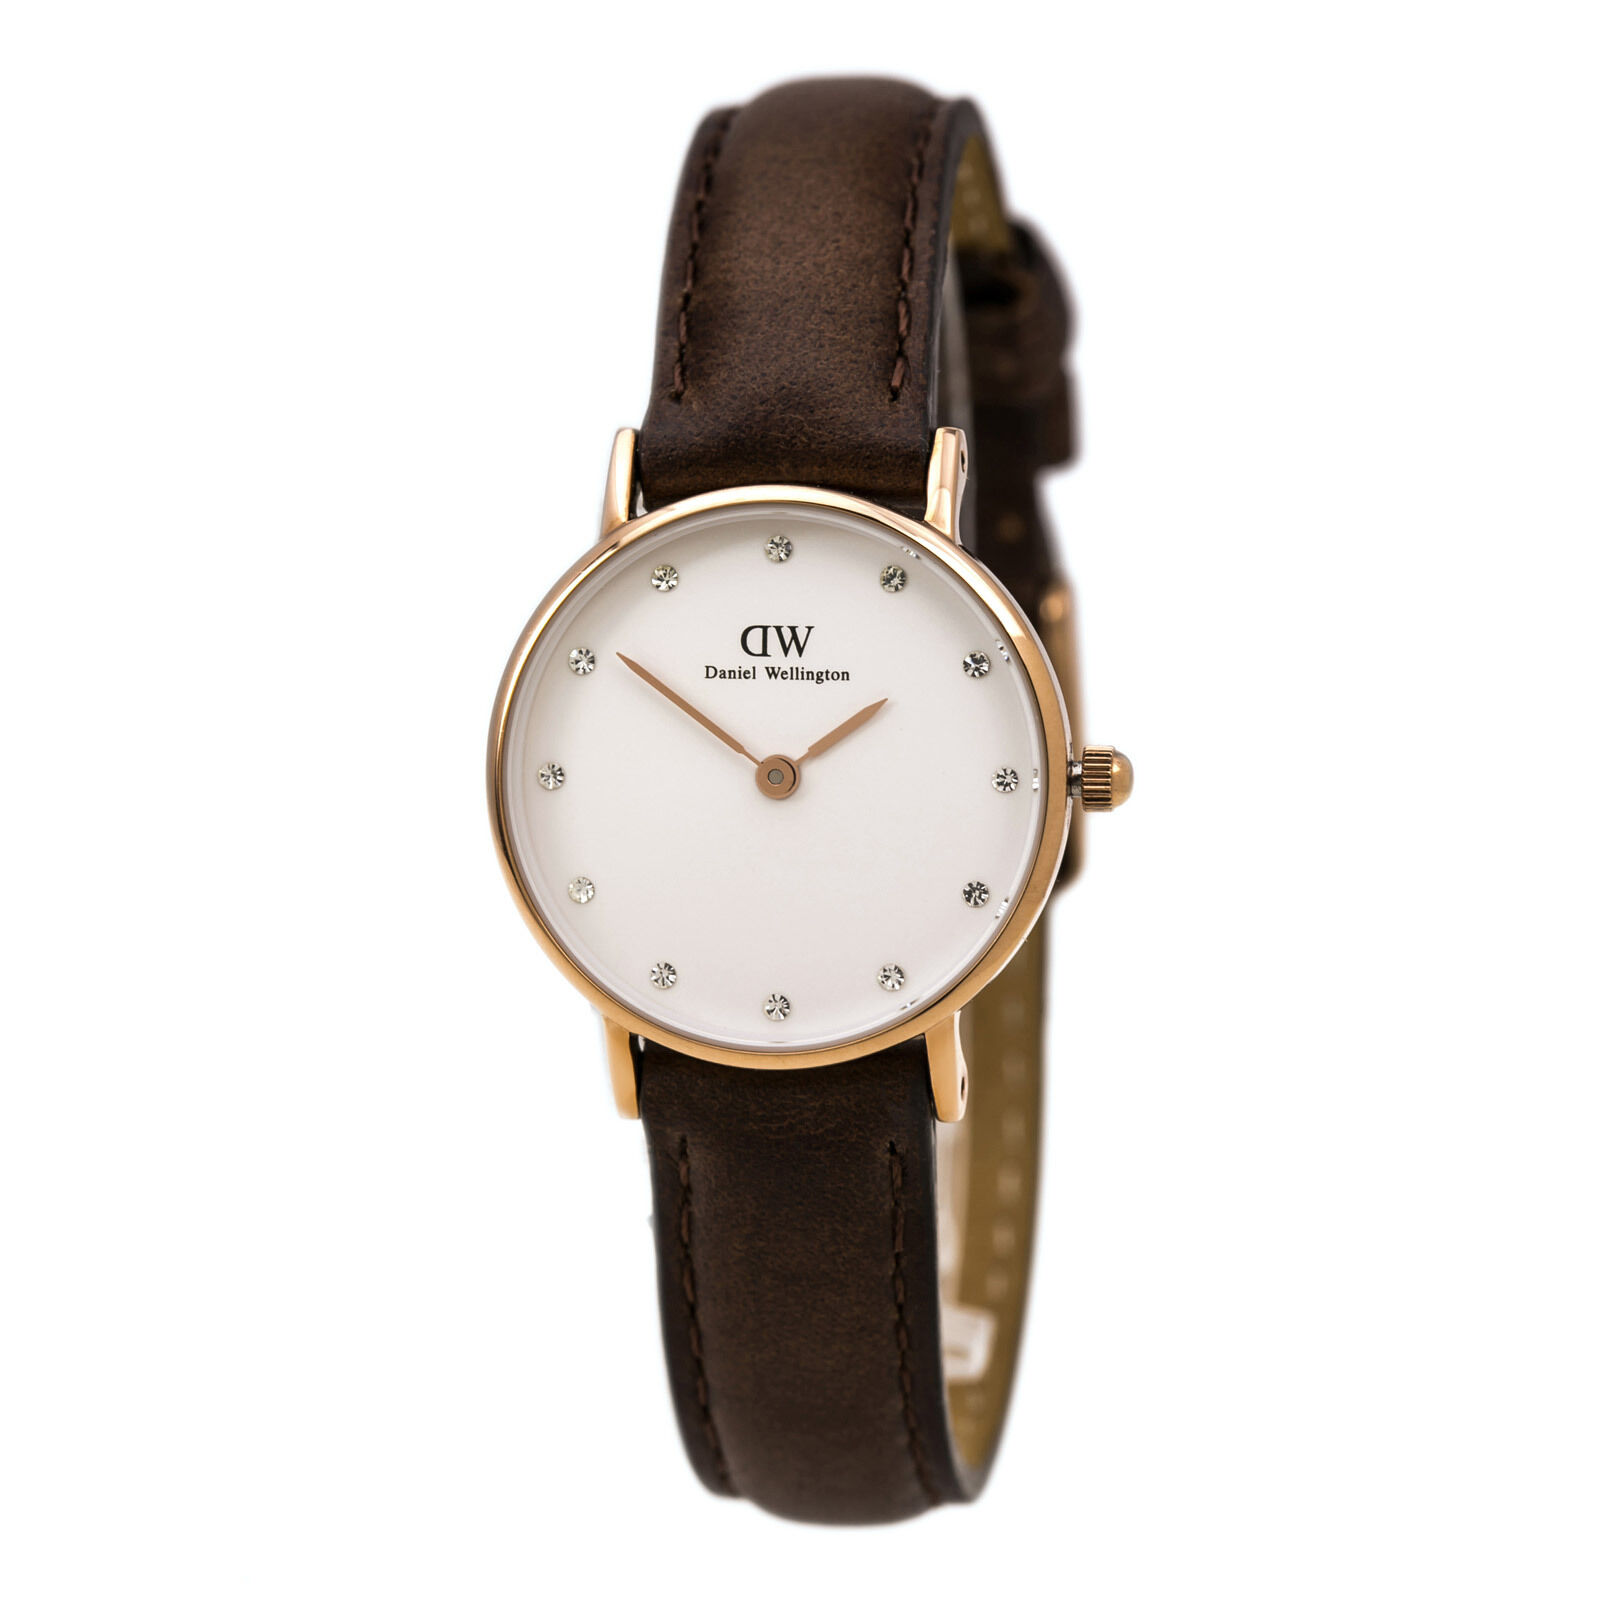 Cross-border:- Daniel Wellington Women's Dark Brown Strap Crystal Watch low price